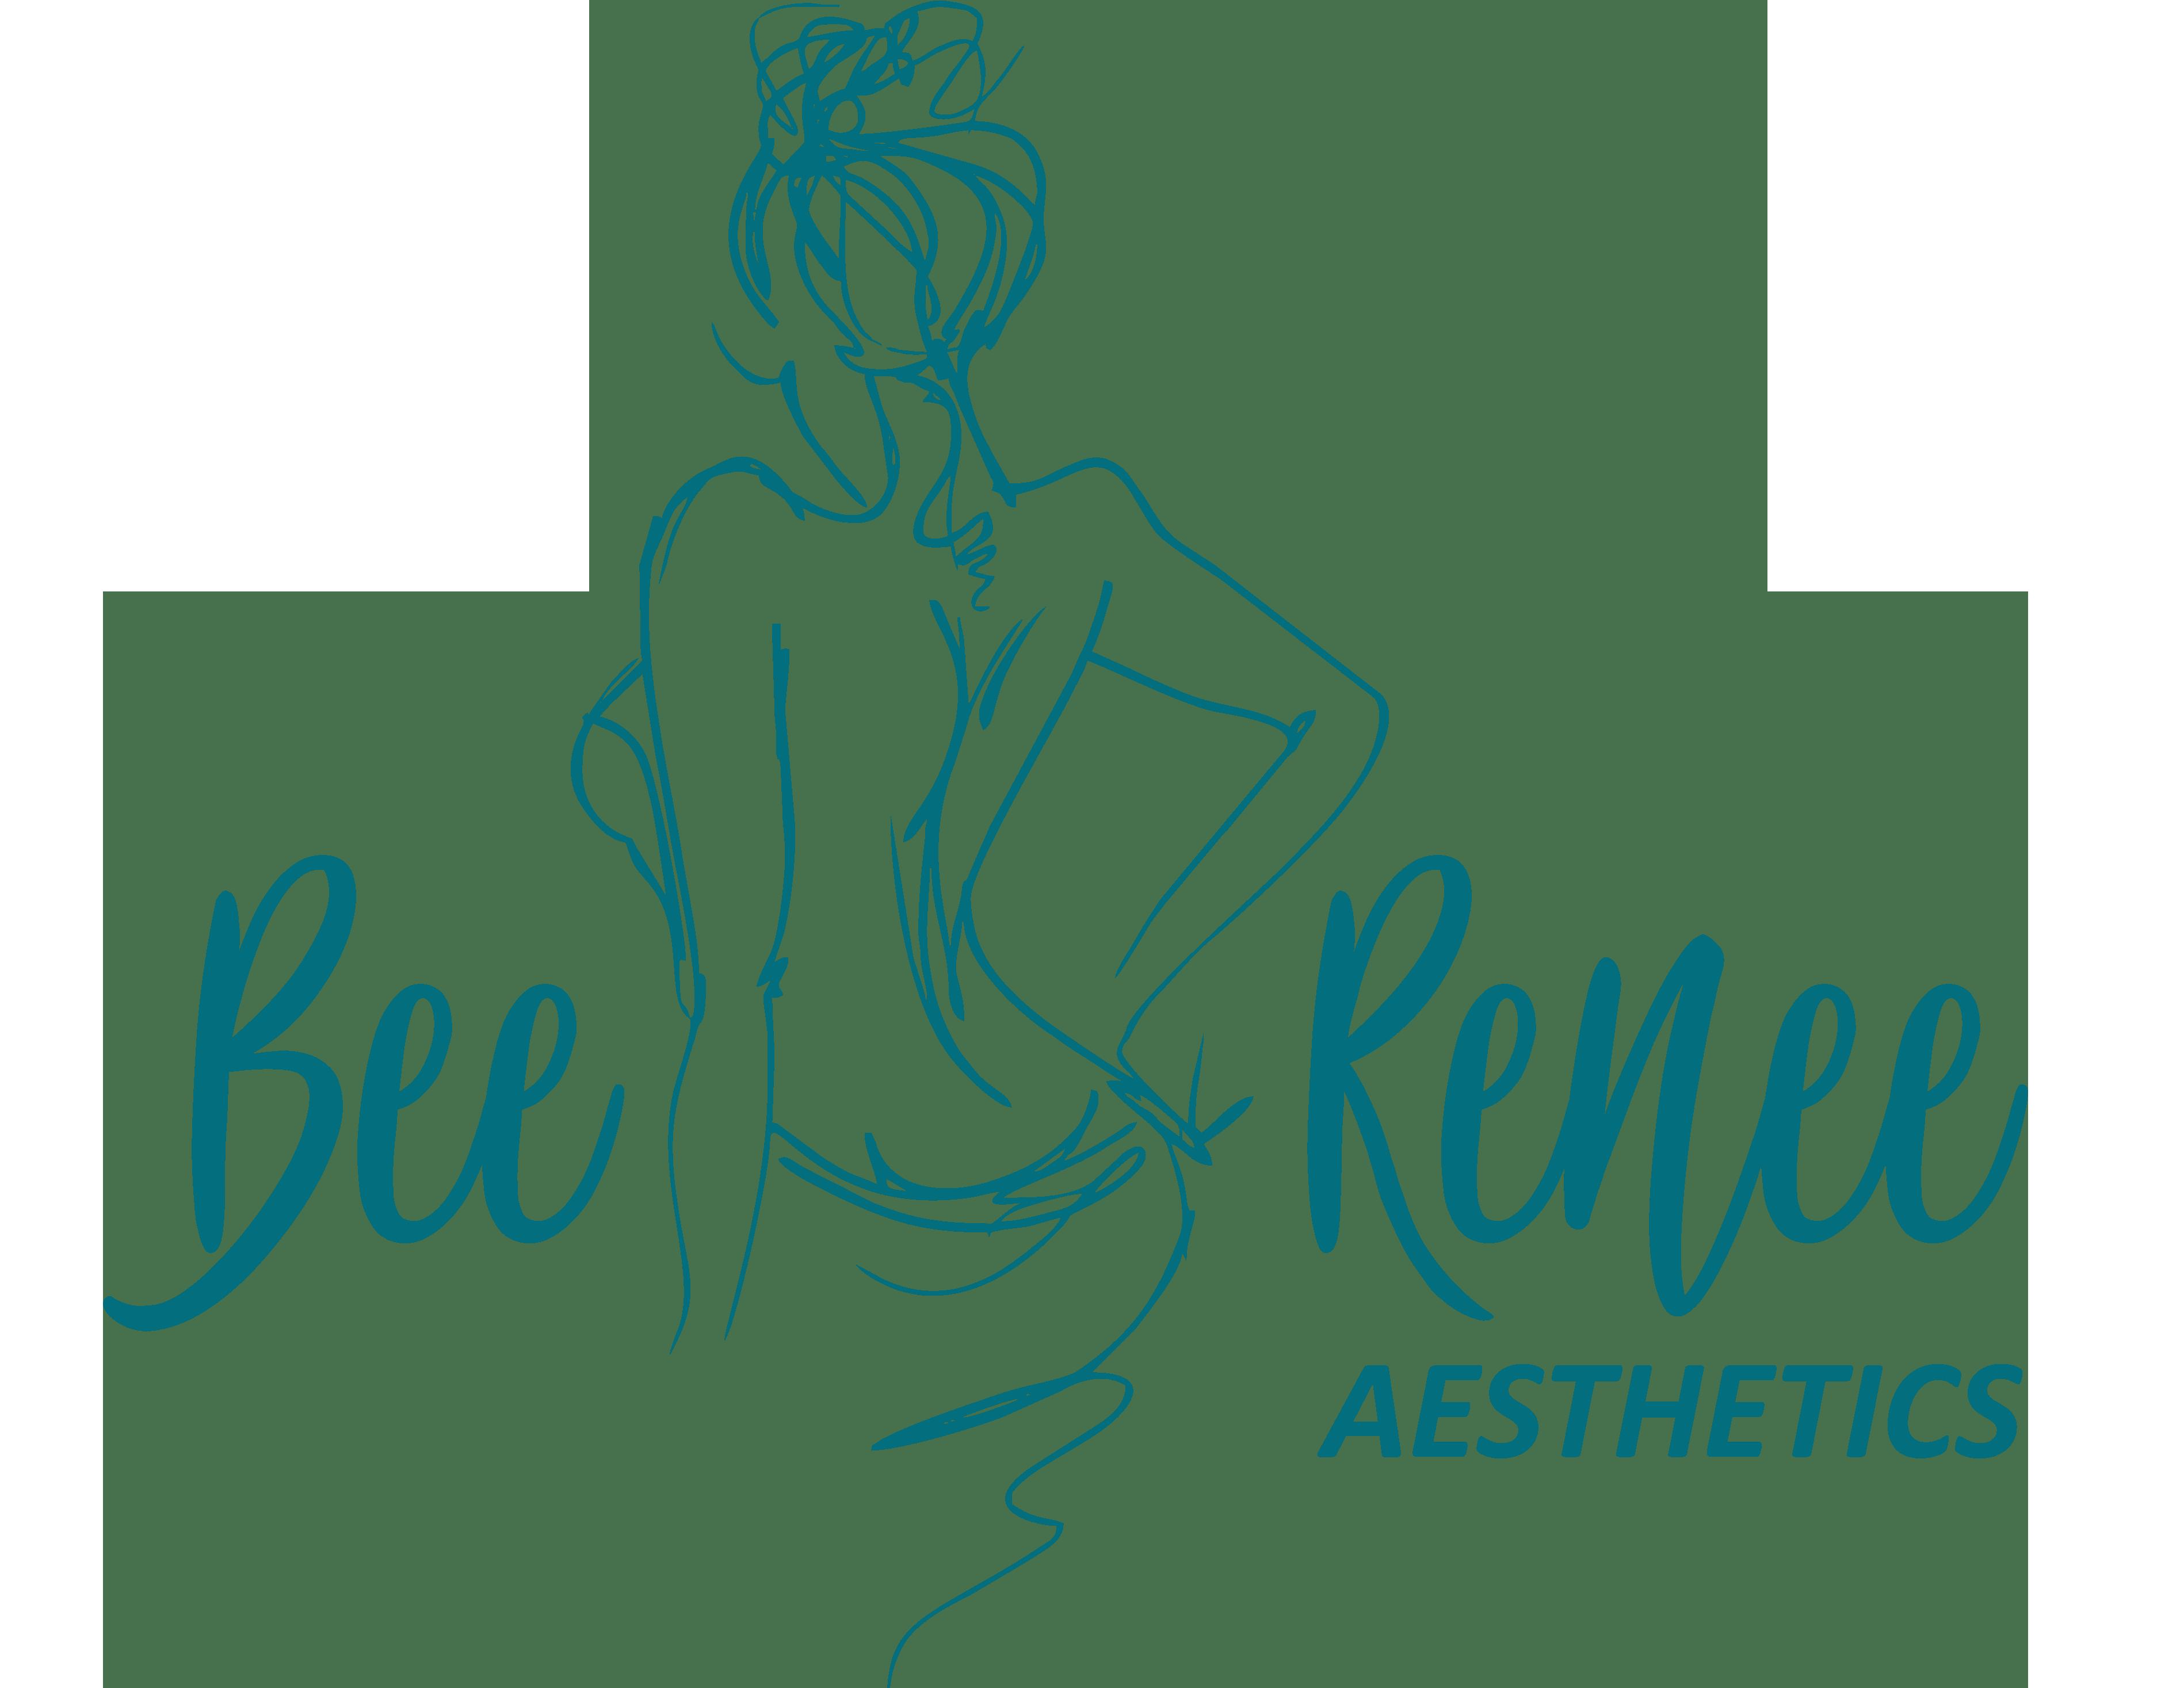 Bee Renee Aesthetics